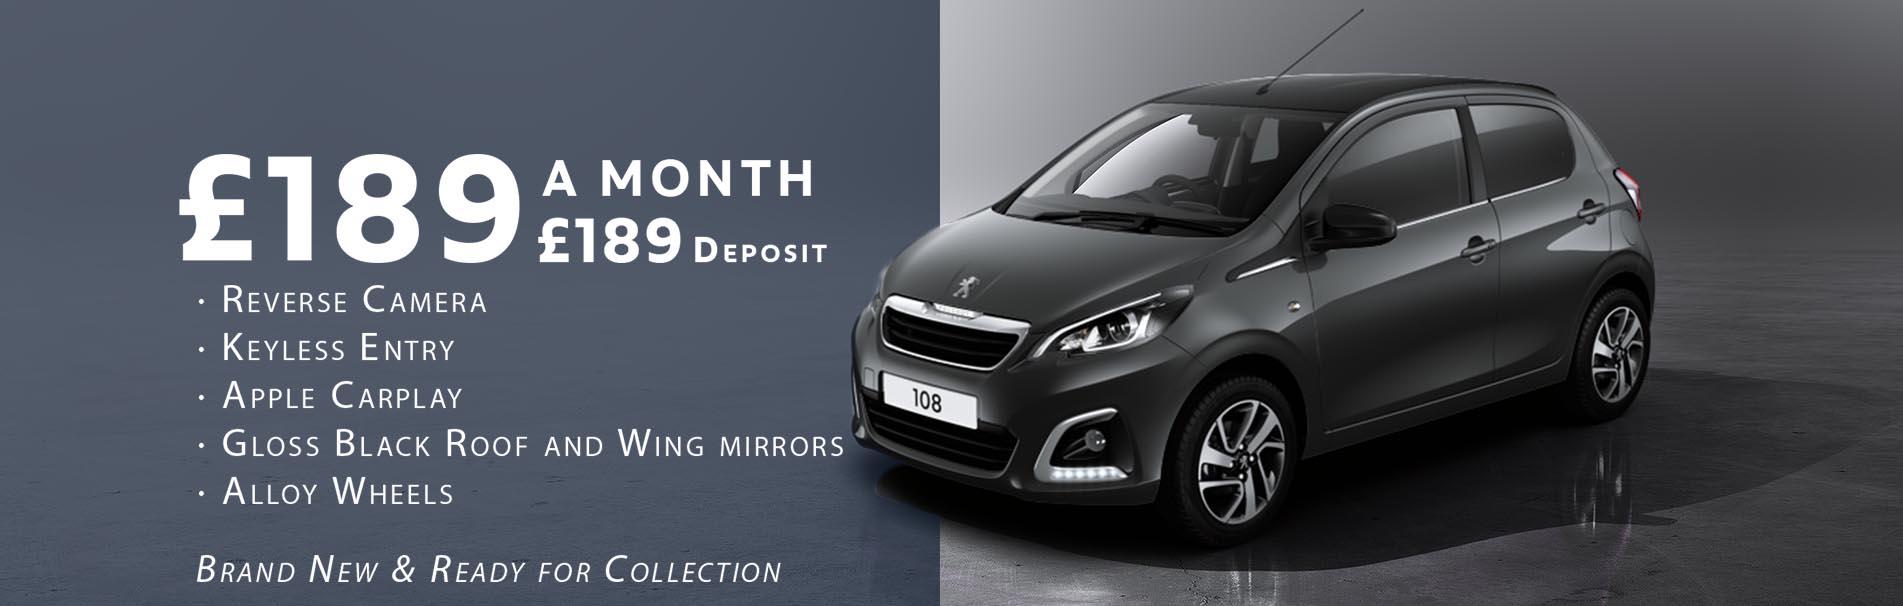 brand-new-peugeot-108-carbon-grey-189-deposit-189-a-month-sli